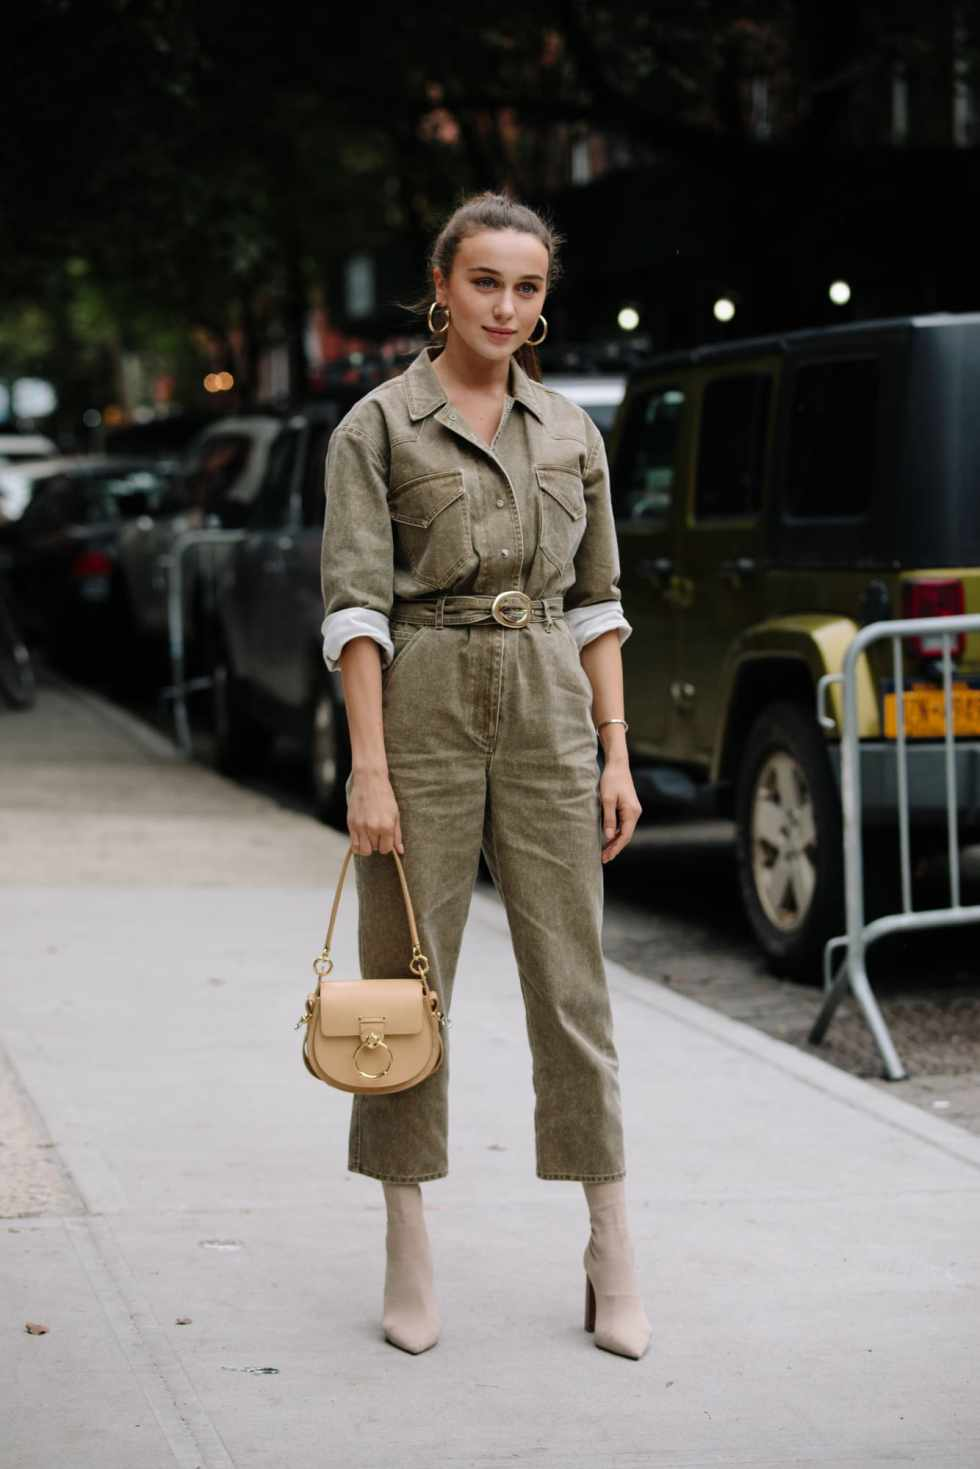 new-york-fashion-week-street-style-spring-2019-day-3-10